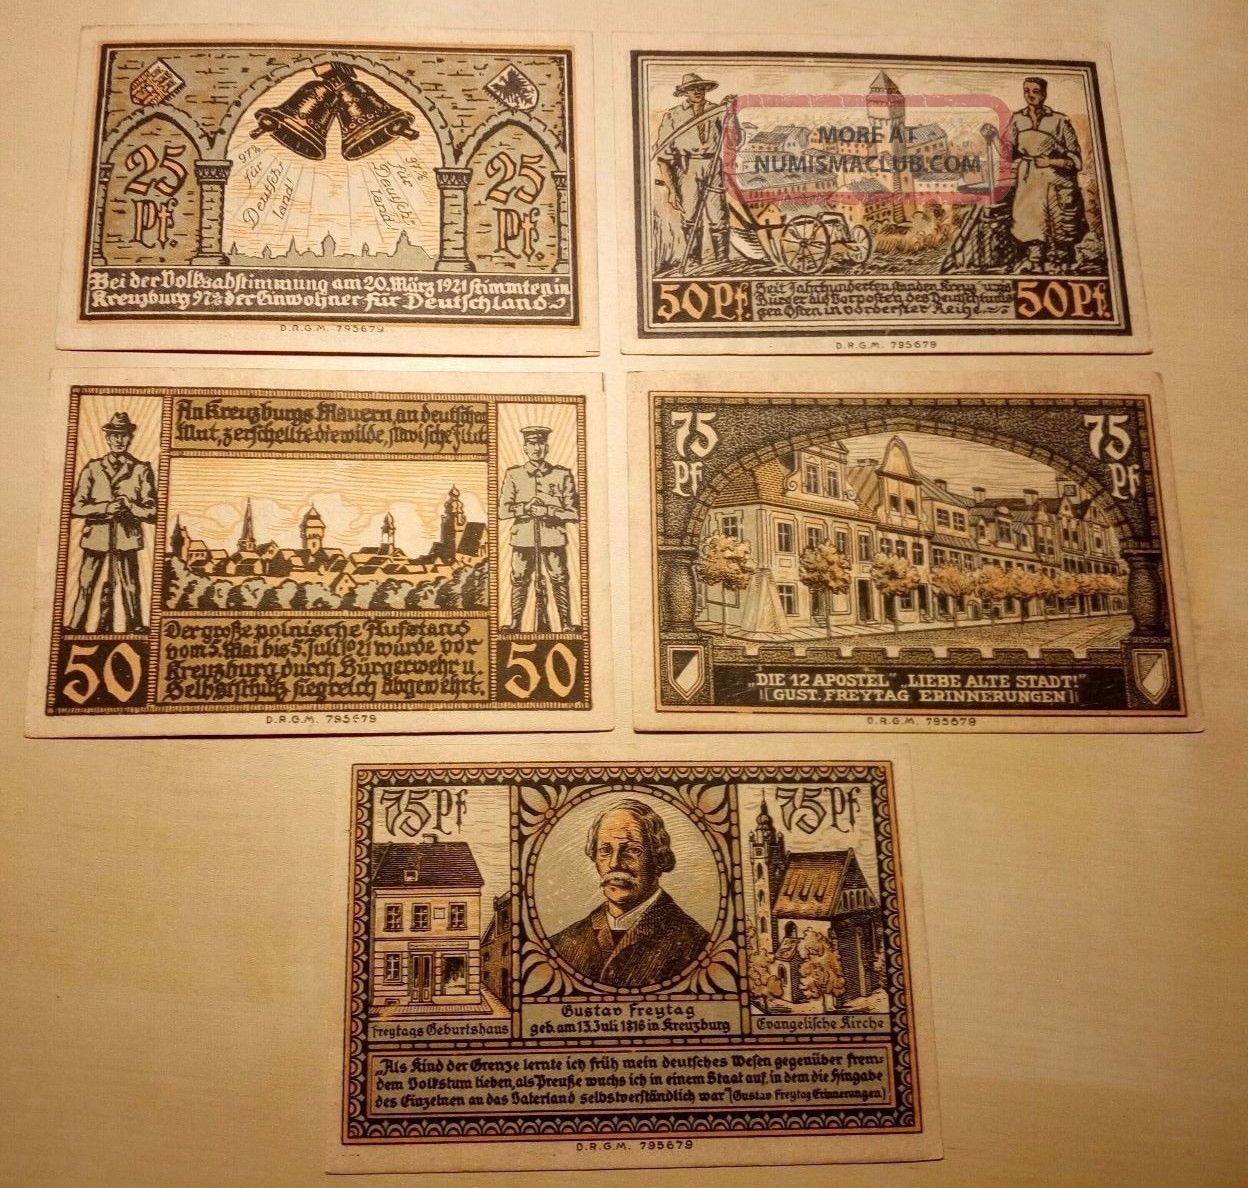 1921 Notgeld Kreuzburg In Oberschlesien Complete Series Europe photo